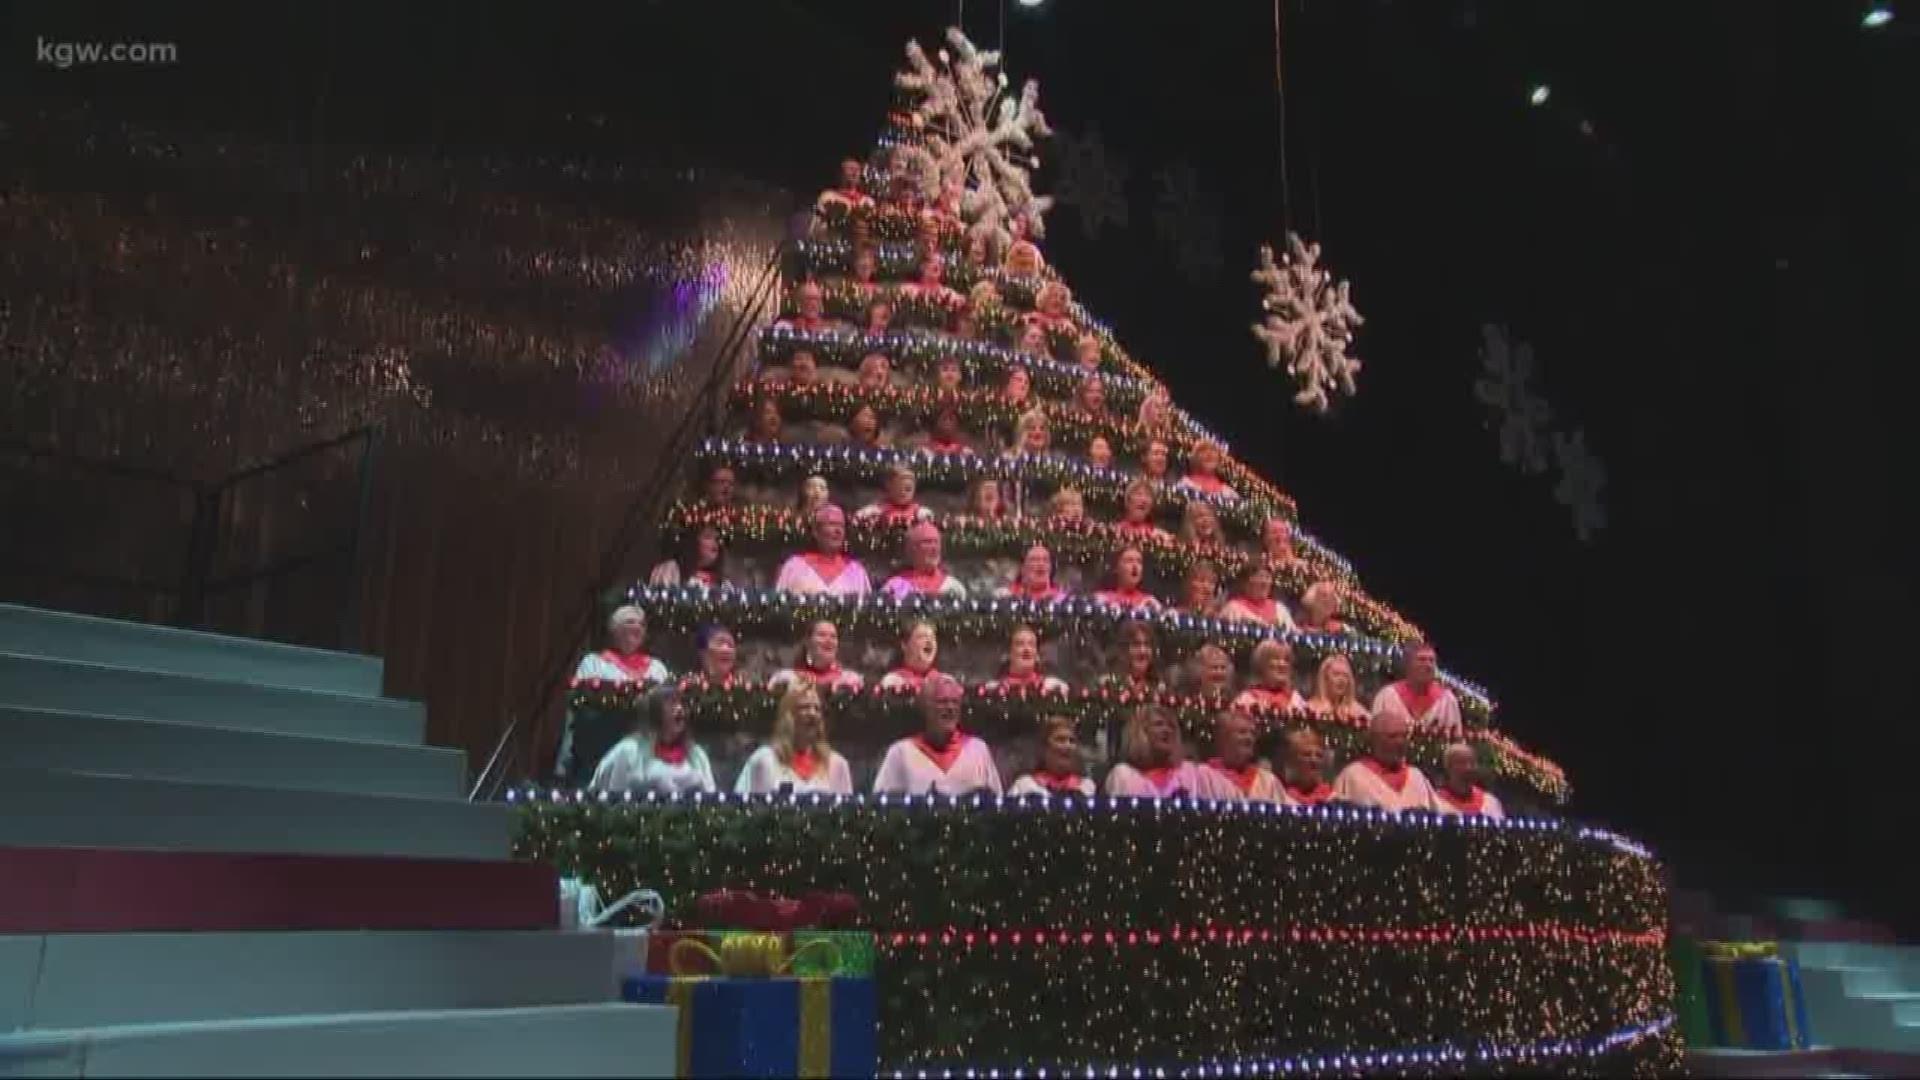 Get ready for Portland's Singing Christmas Tree | kgw.com